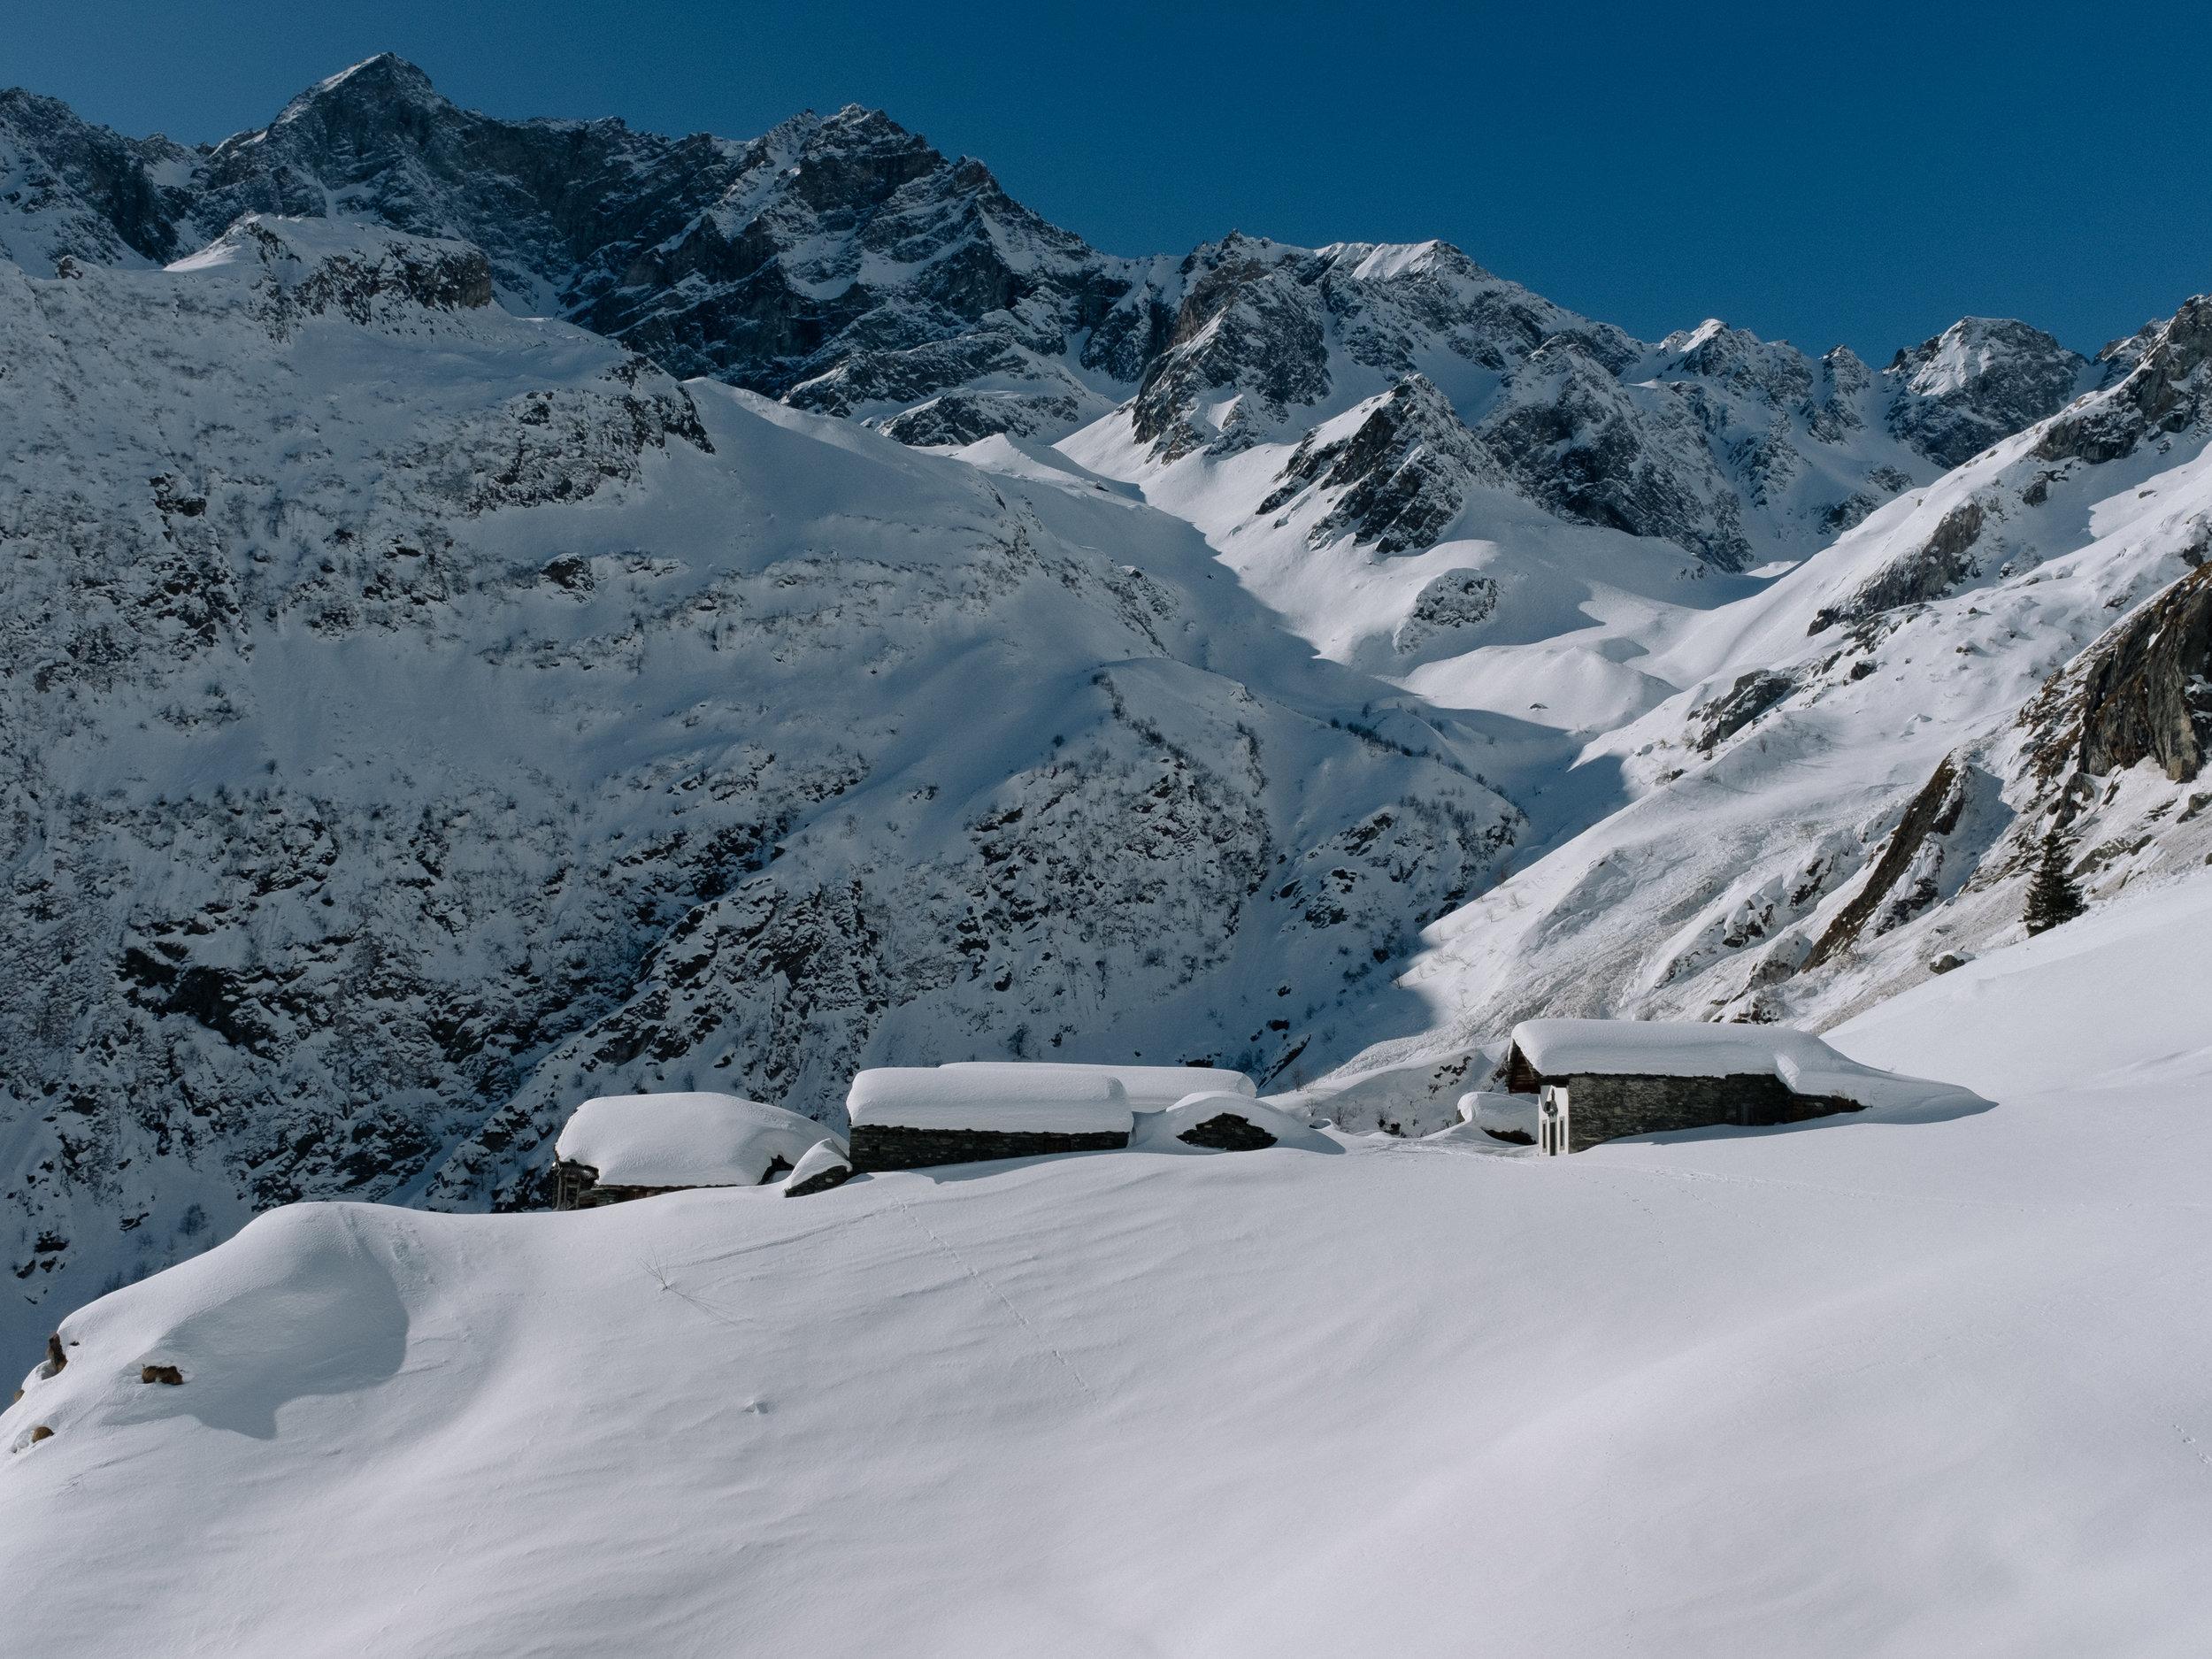 BenReadPhotography_Skiing_Alagna-5.jpg